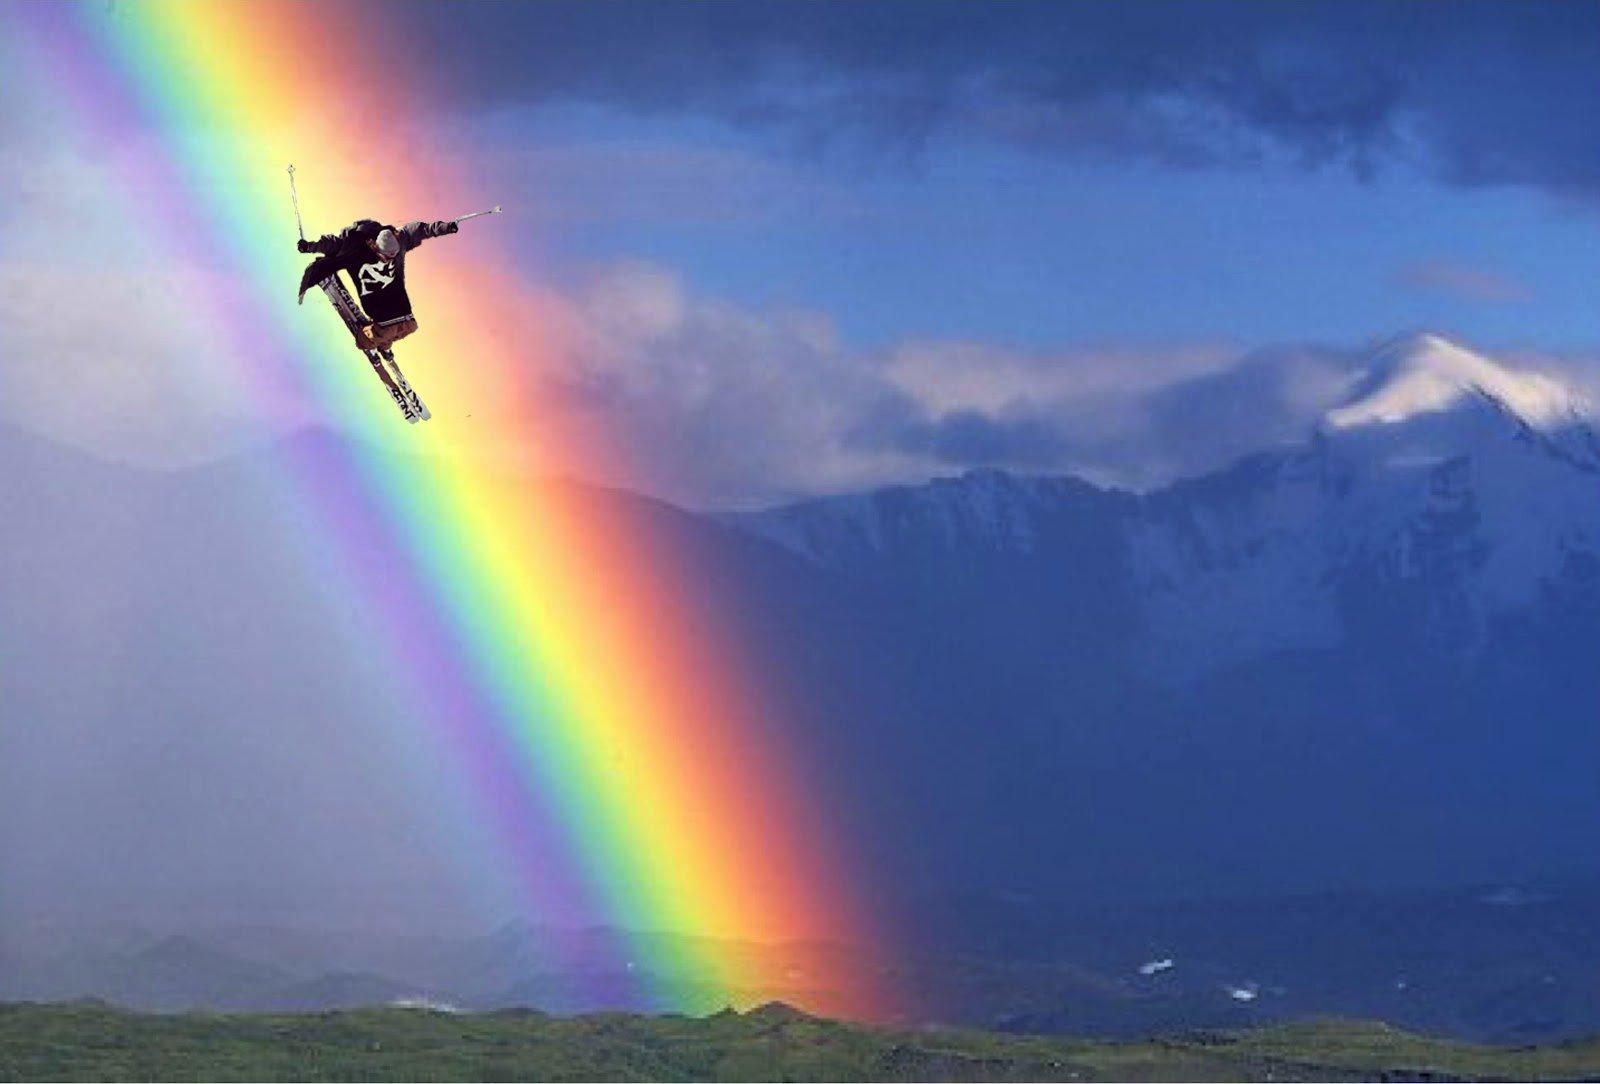 Rainbow Drop-In